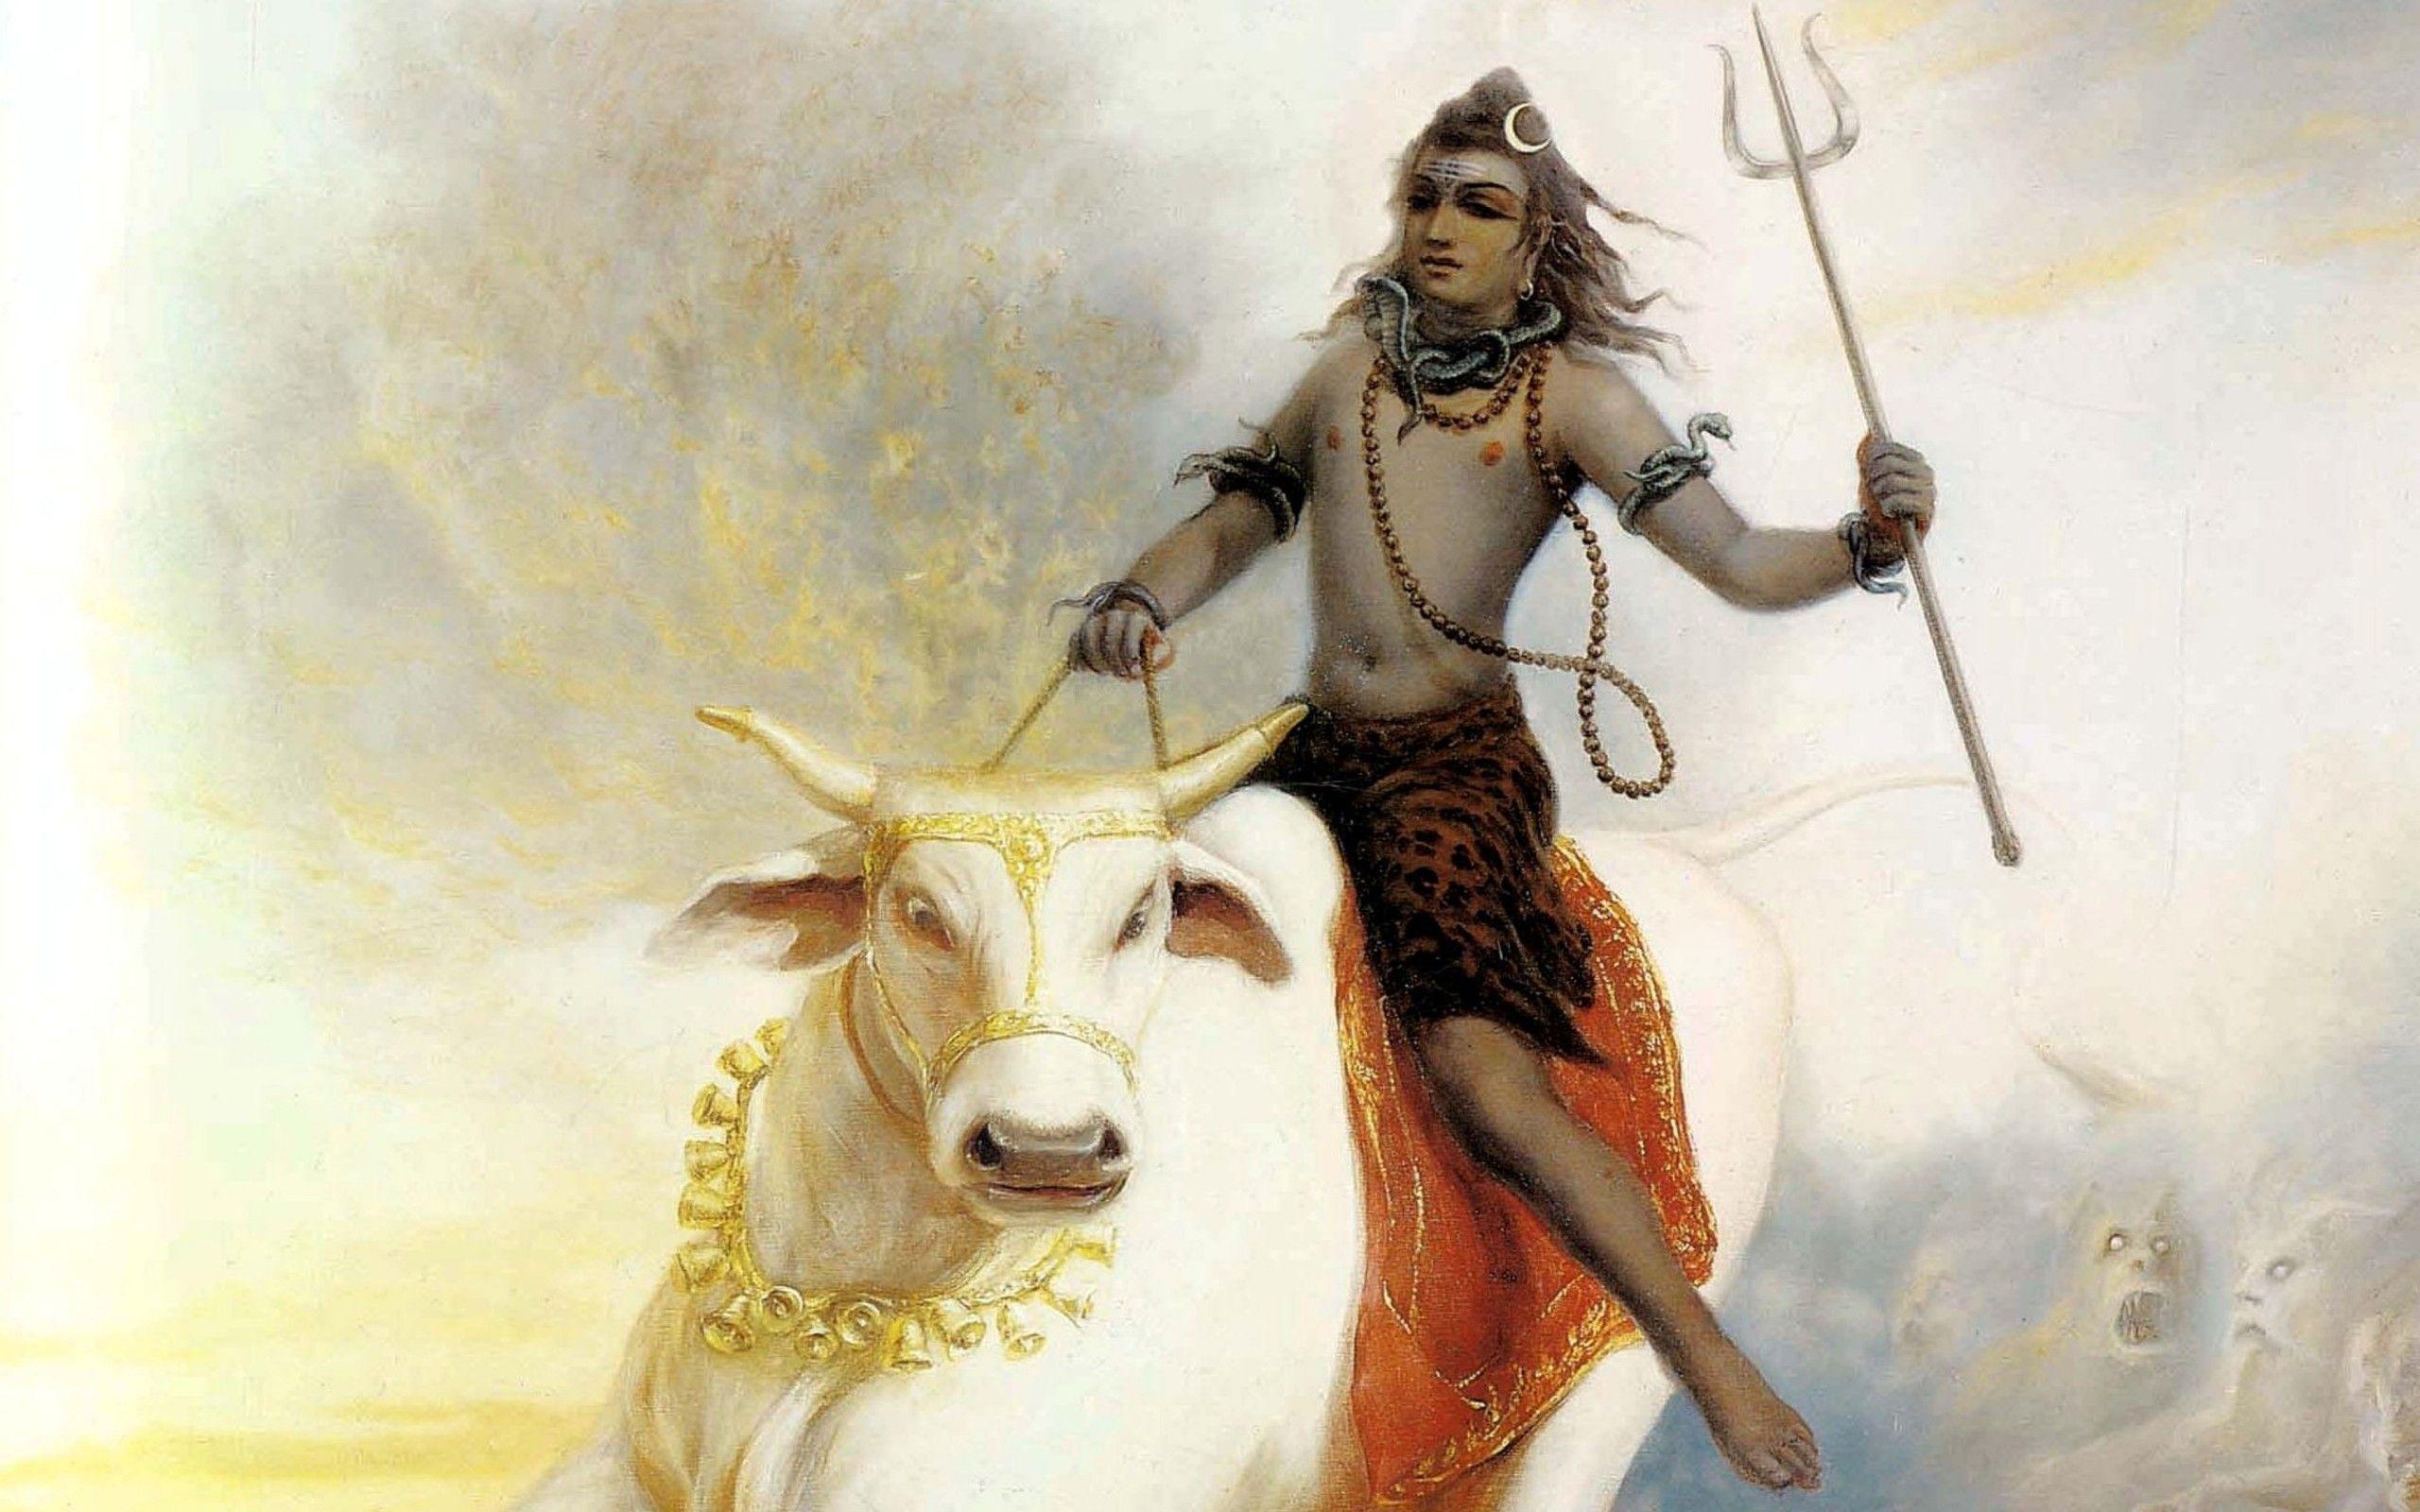 Wallpaper Lord Shiva Aghori Hd Creative Graphics 12691: Lord Shiva Riding Nandi